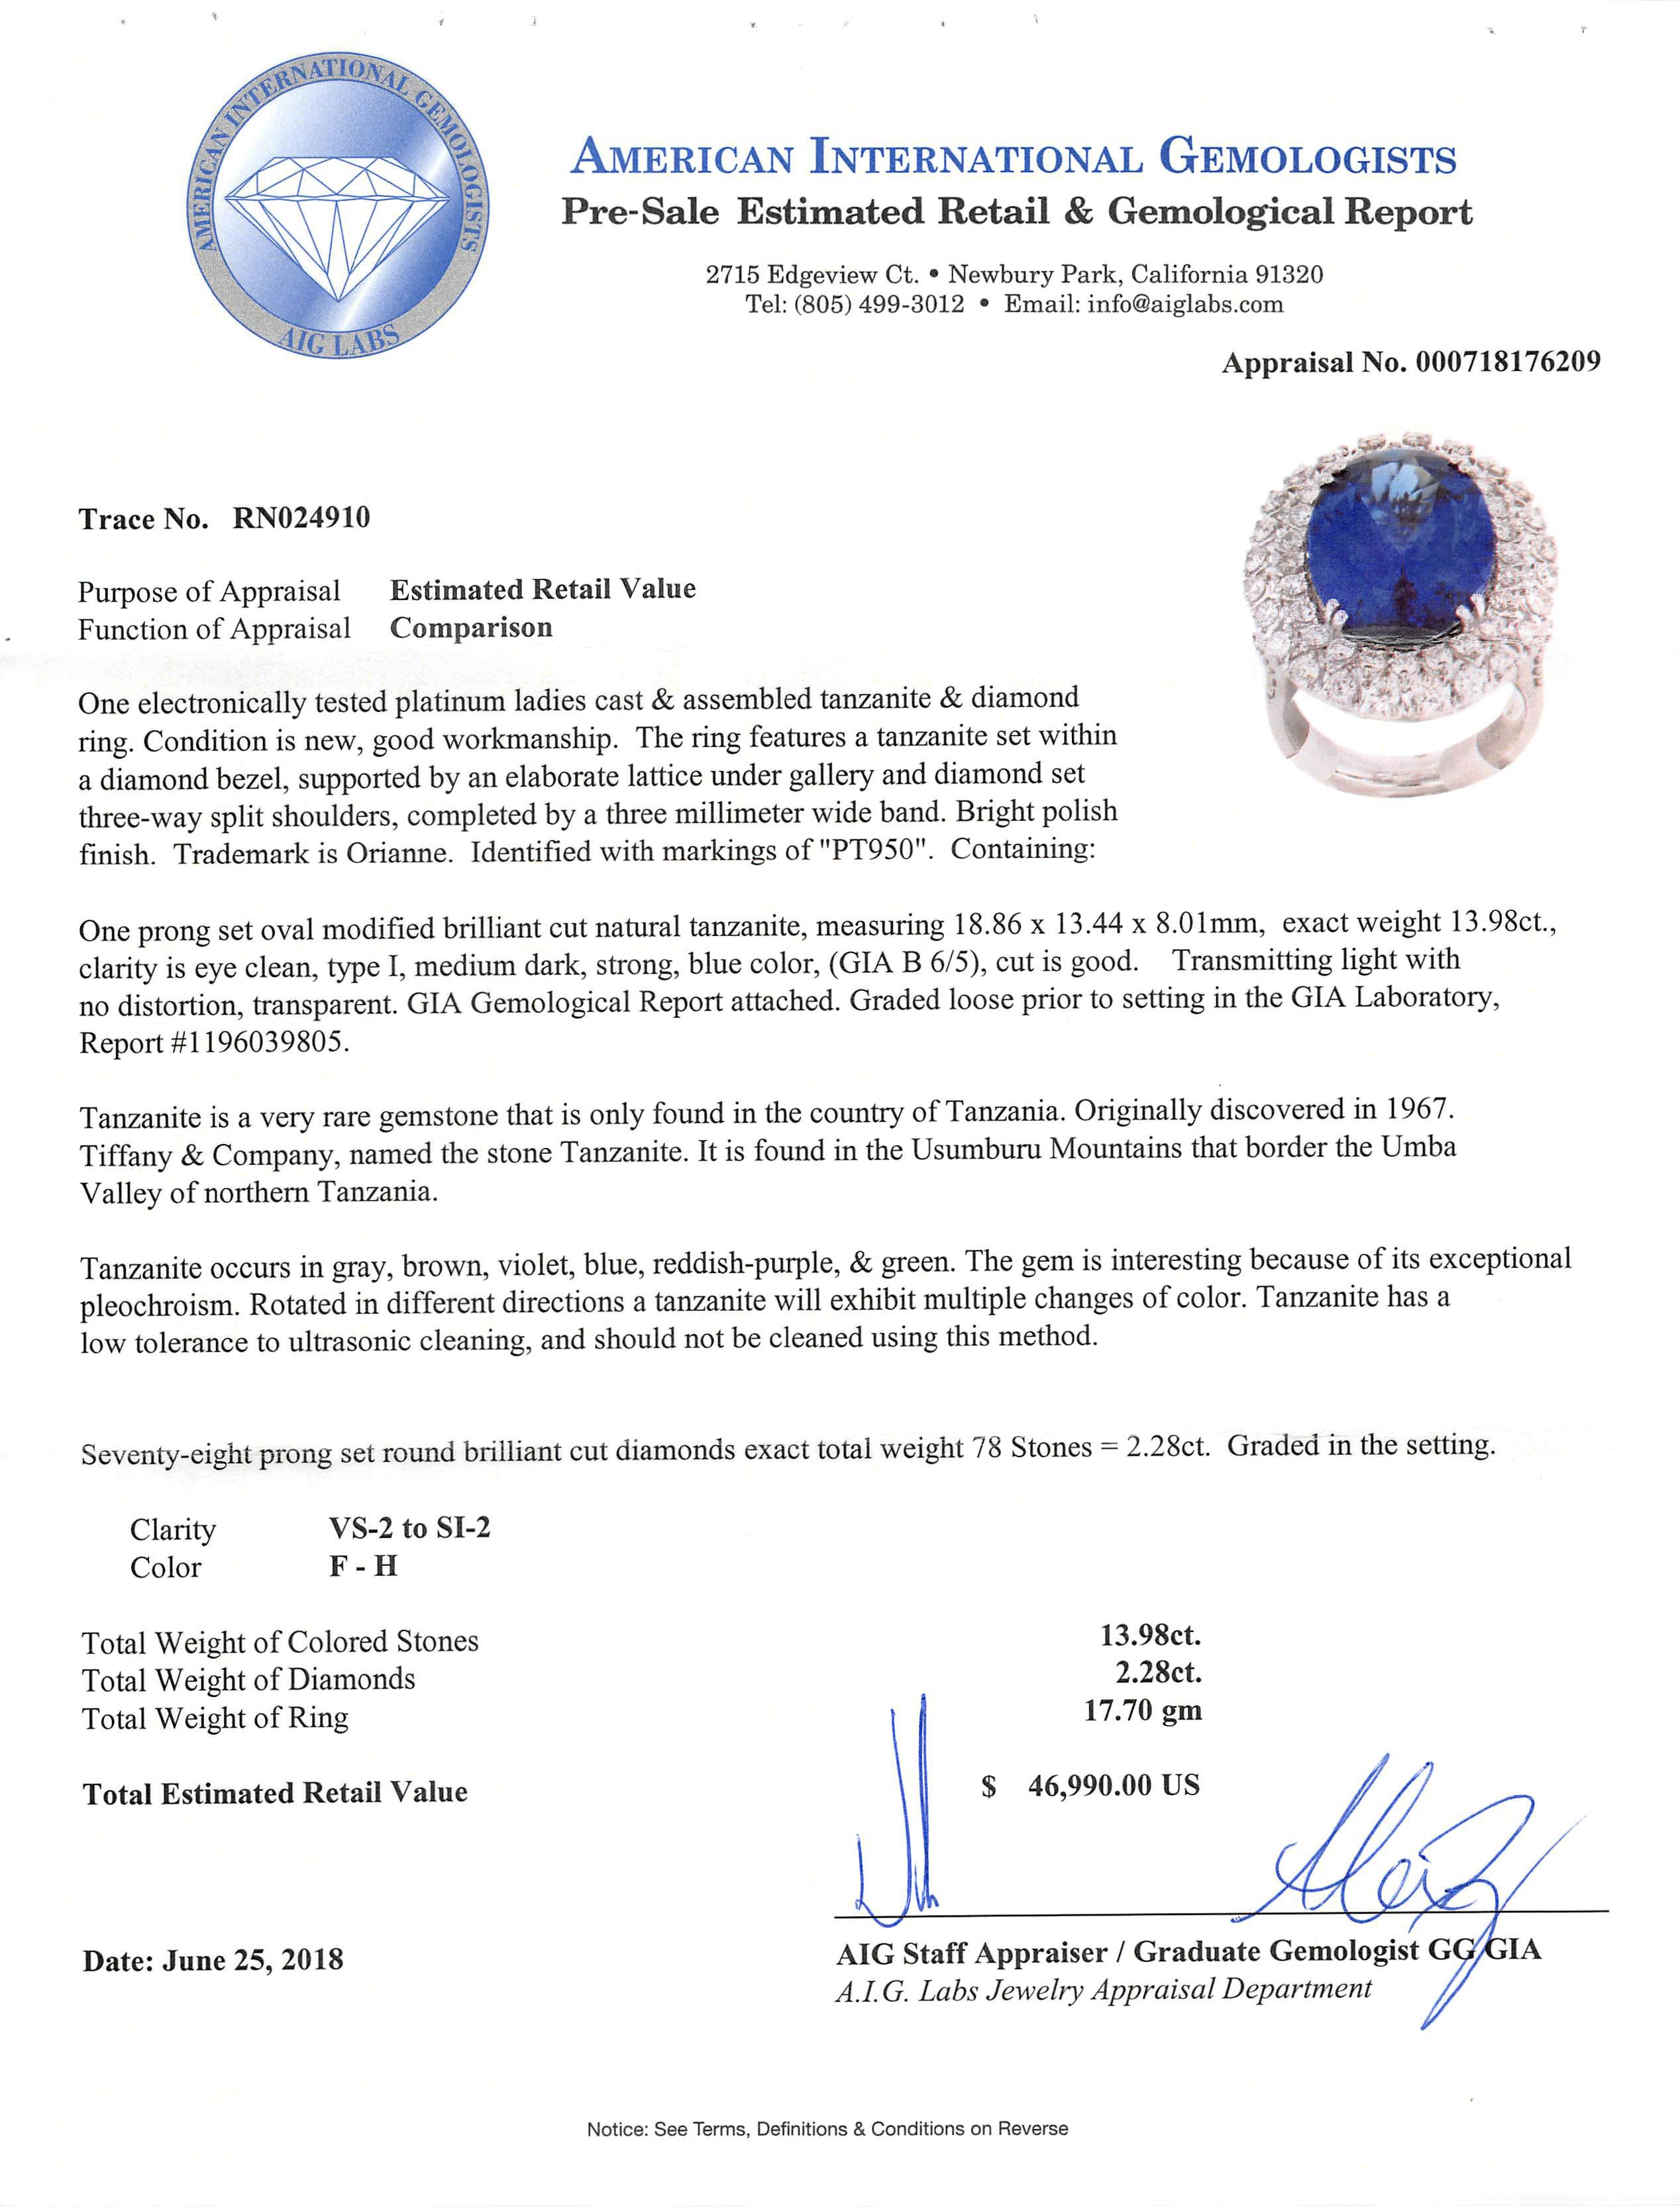 Lot 588 - Platinum, Tanzanite and Diamond Ring , prong set oval modified brilliant cut tanzanite, 18.86 x 13.